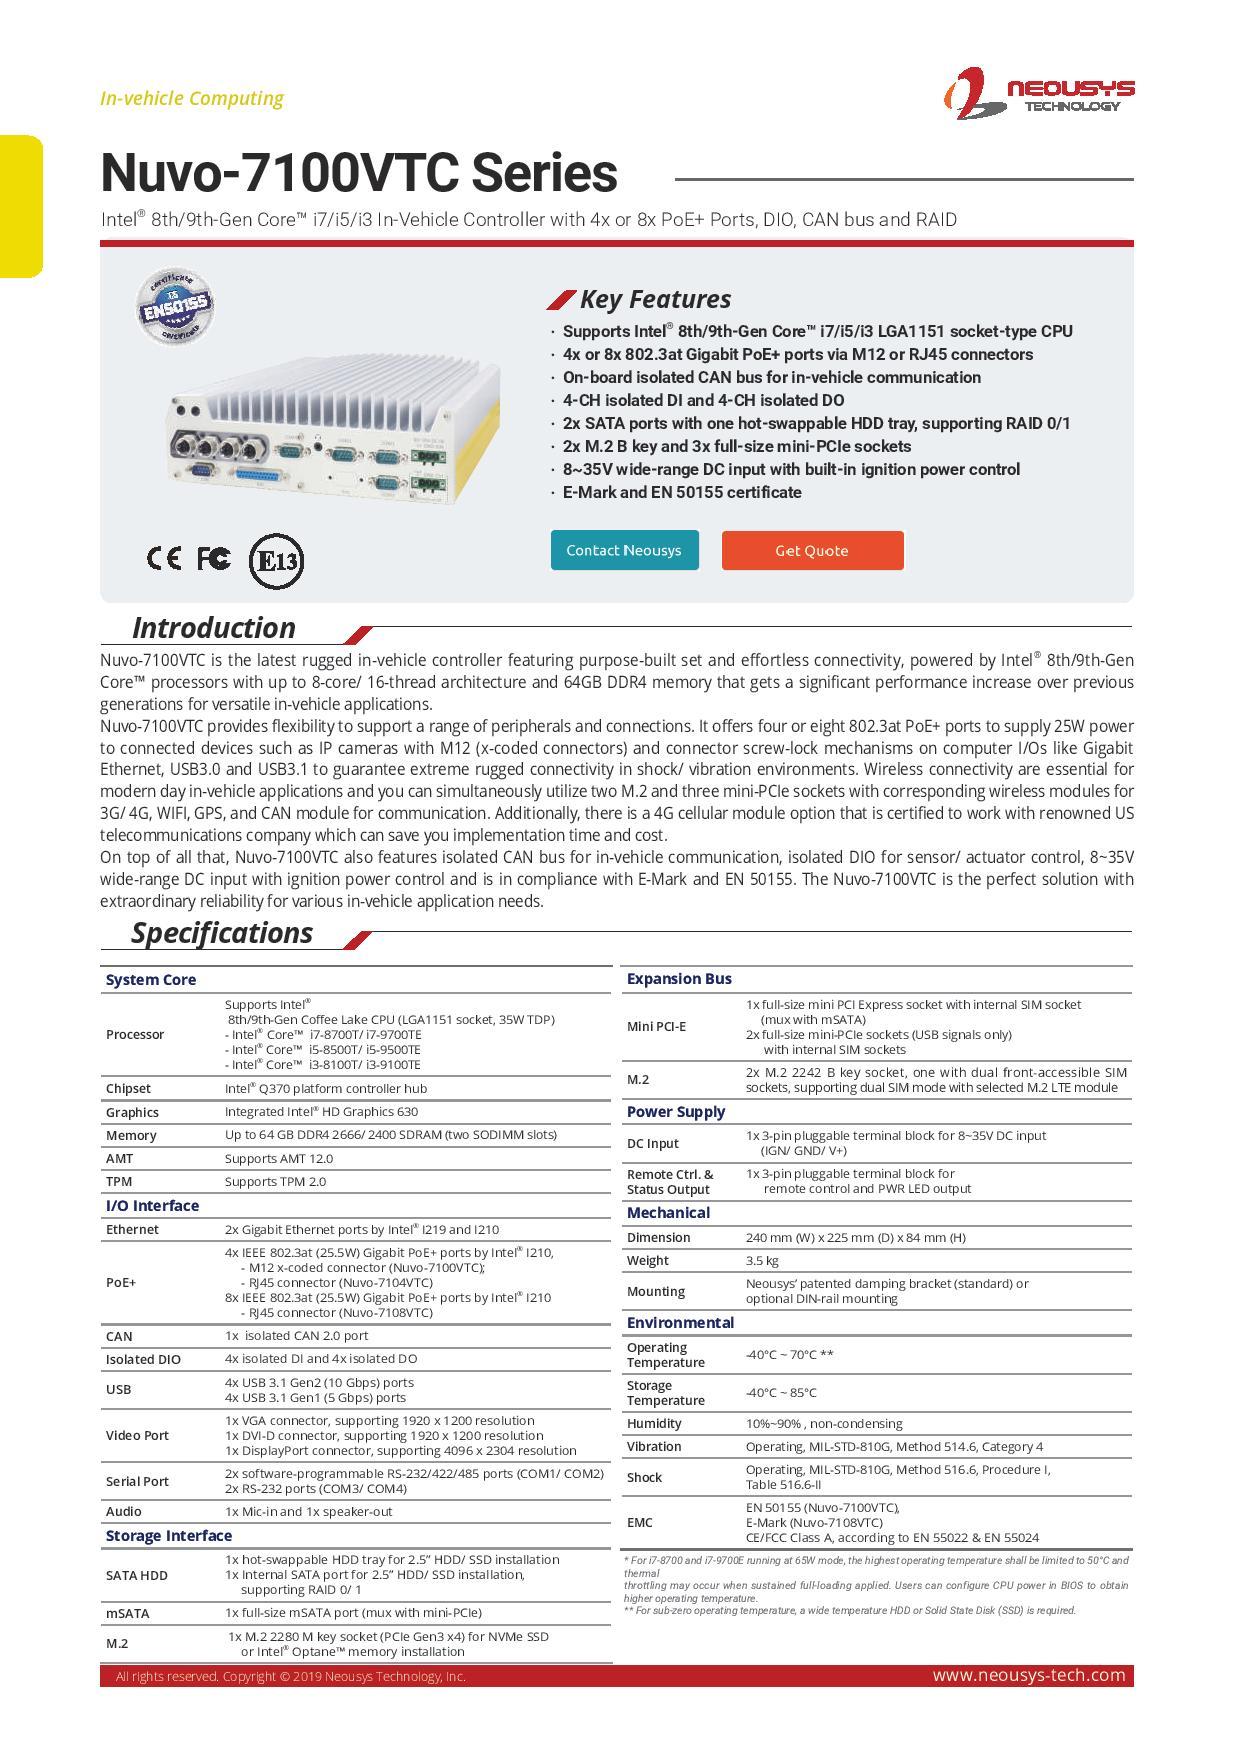 Nuvo-7100VTC | Maya-Tech